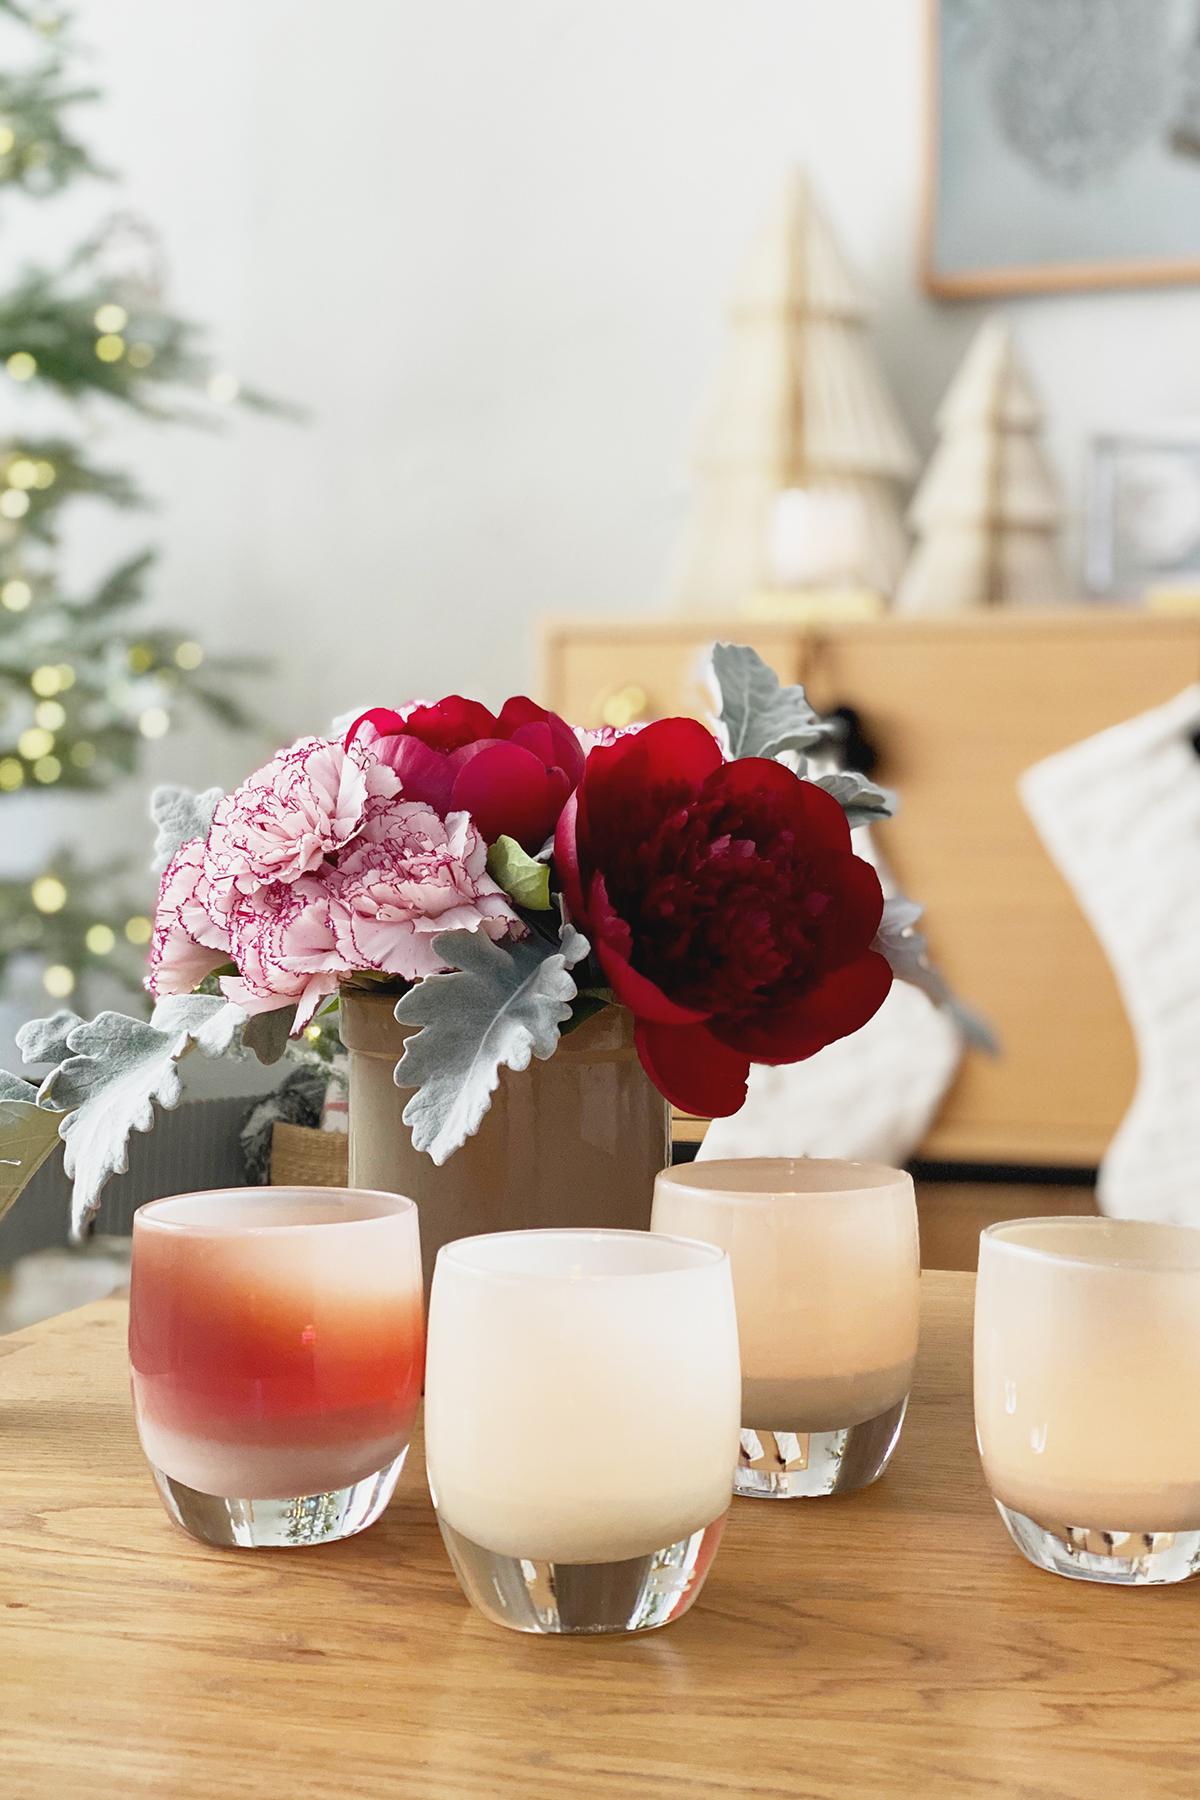 donner à glassybaby en cadeau | Coco Kelley